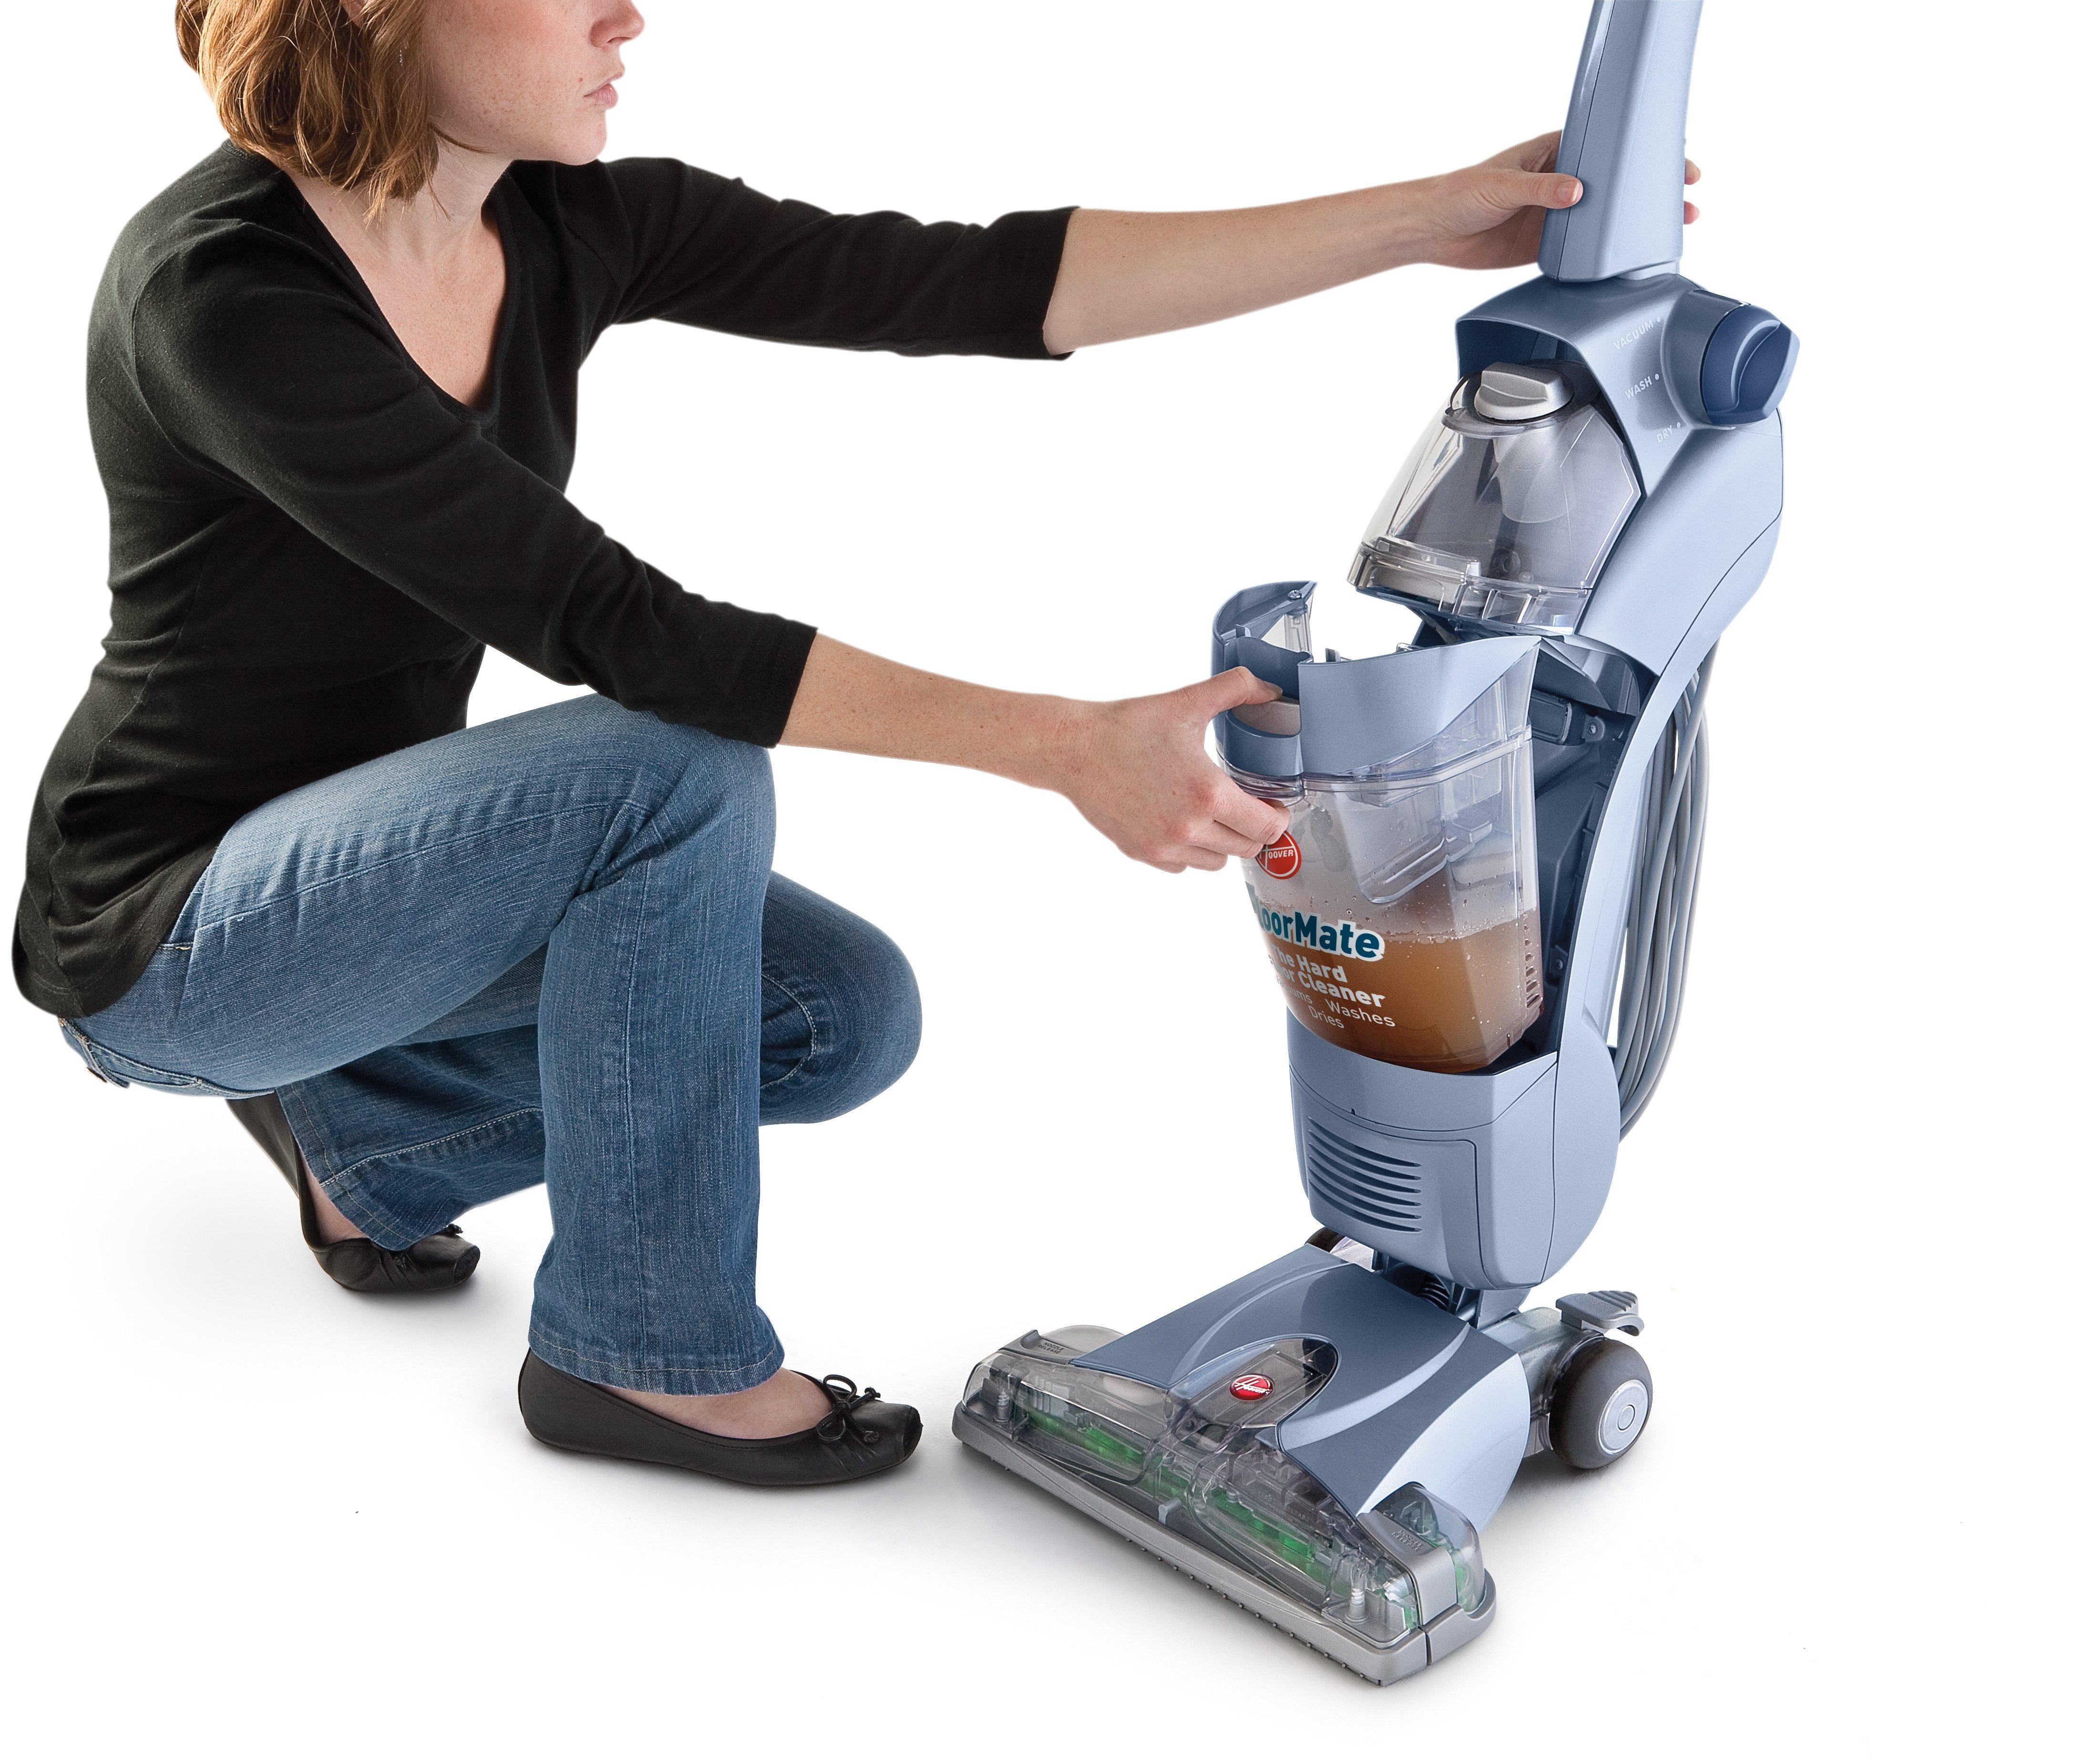 Hoover Floormate Hard Floor Cleaner With Bonus Hard Floor